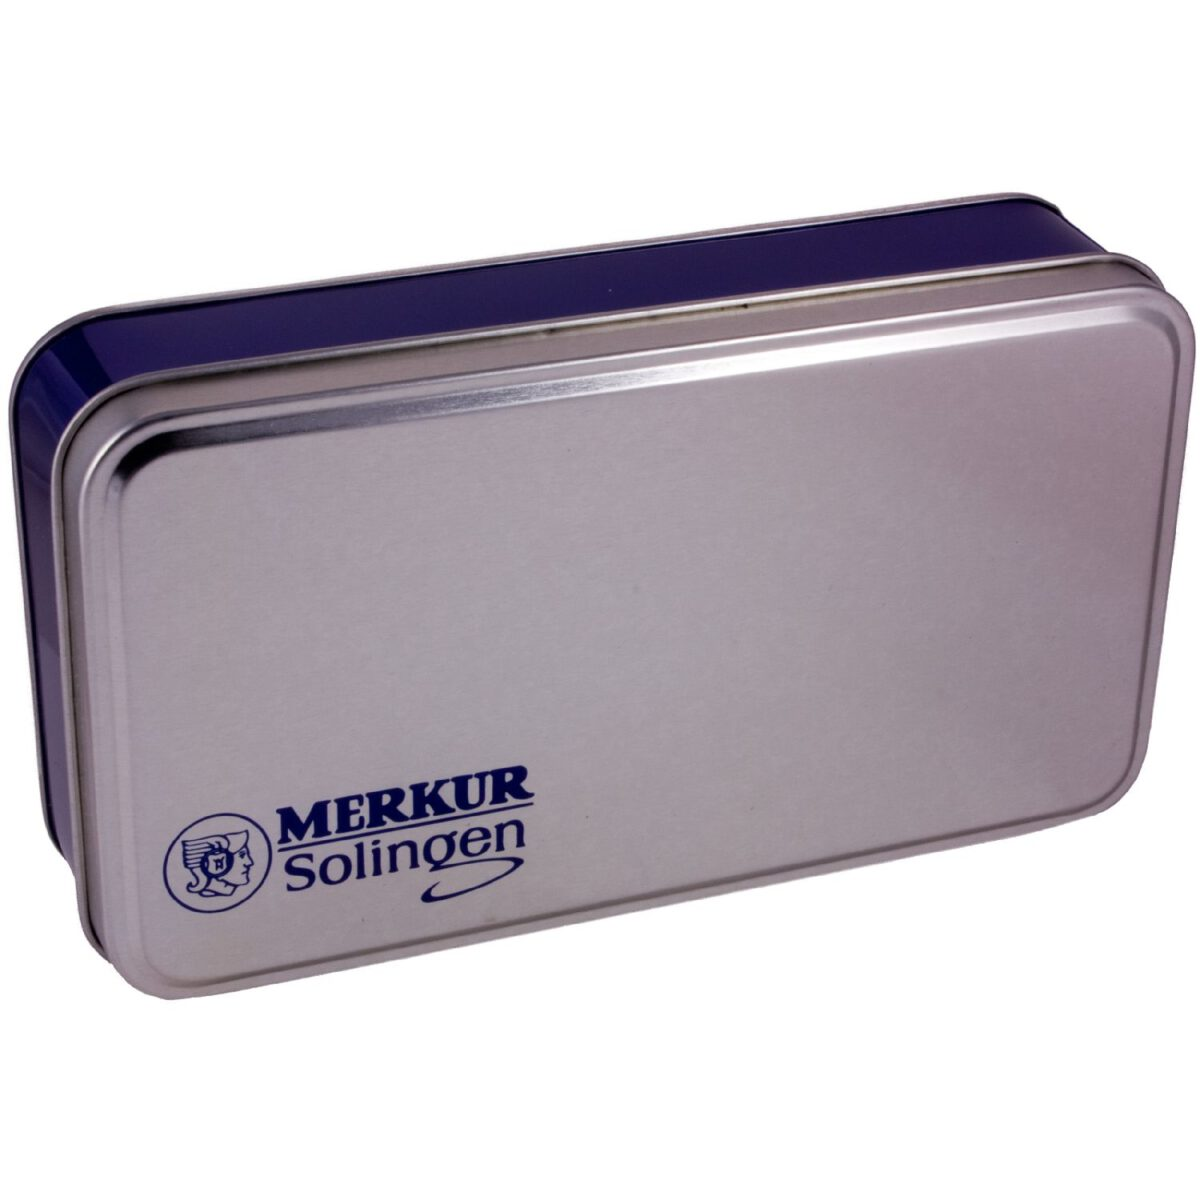 Merkur Futur Adjustable Safety Razor Gift Tin & Blades - Satin-2494